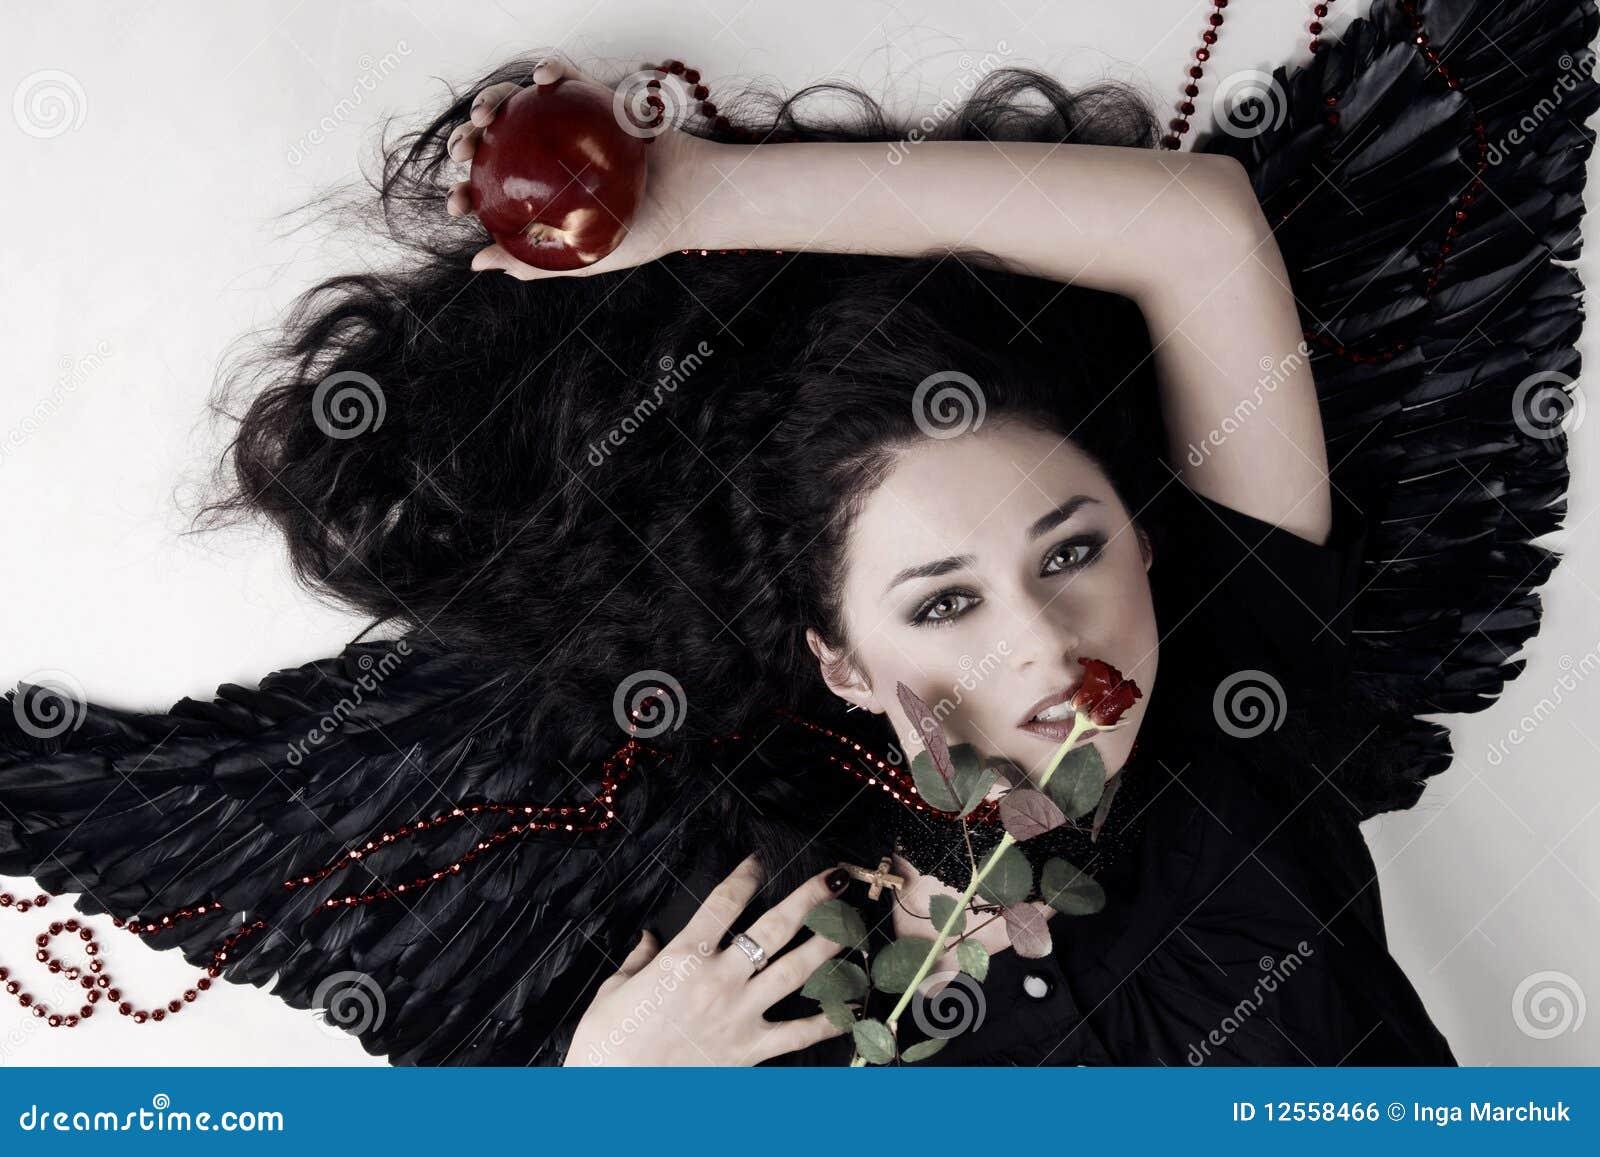 Dark angel girl nude-5869